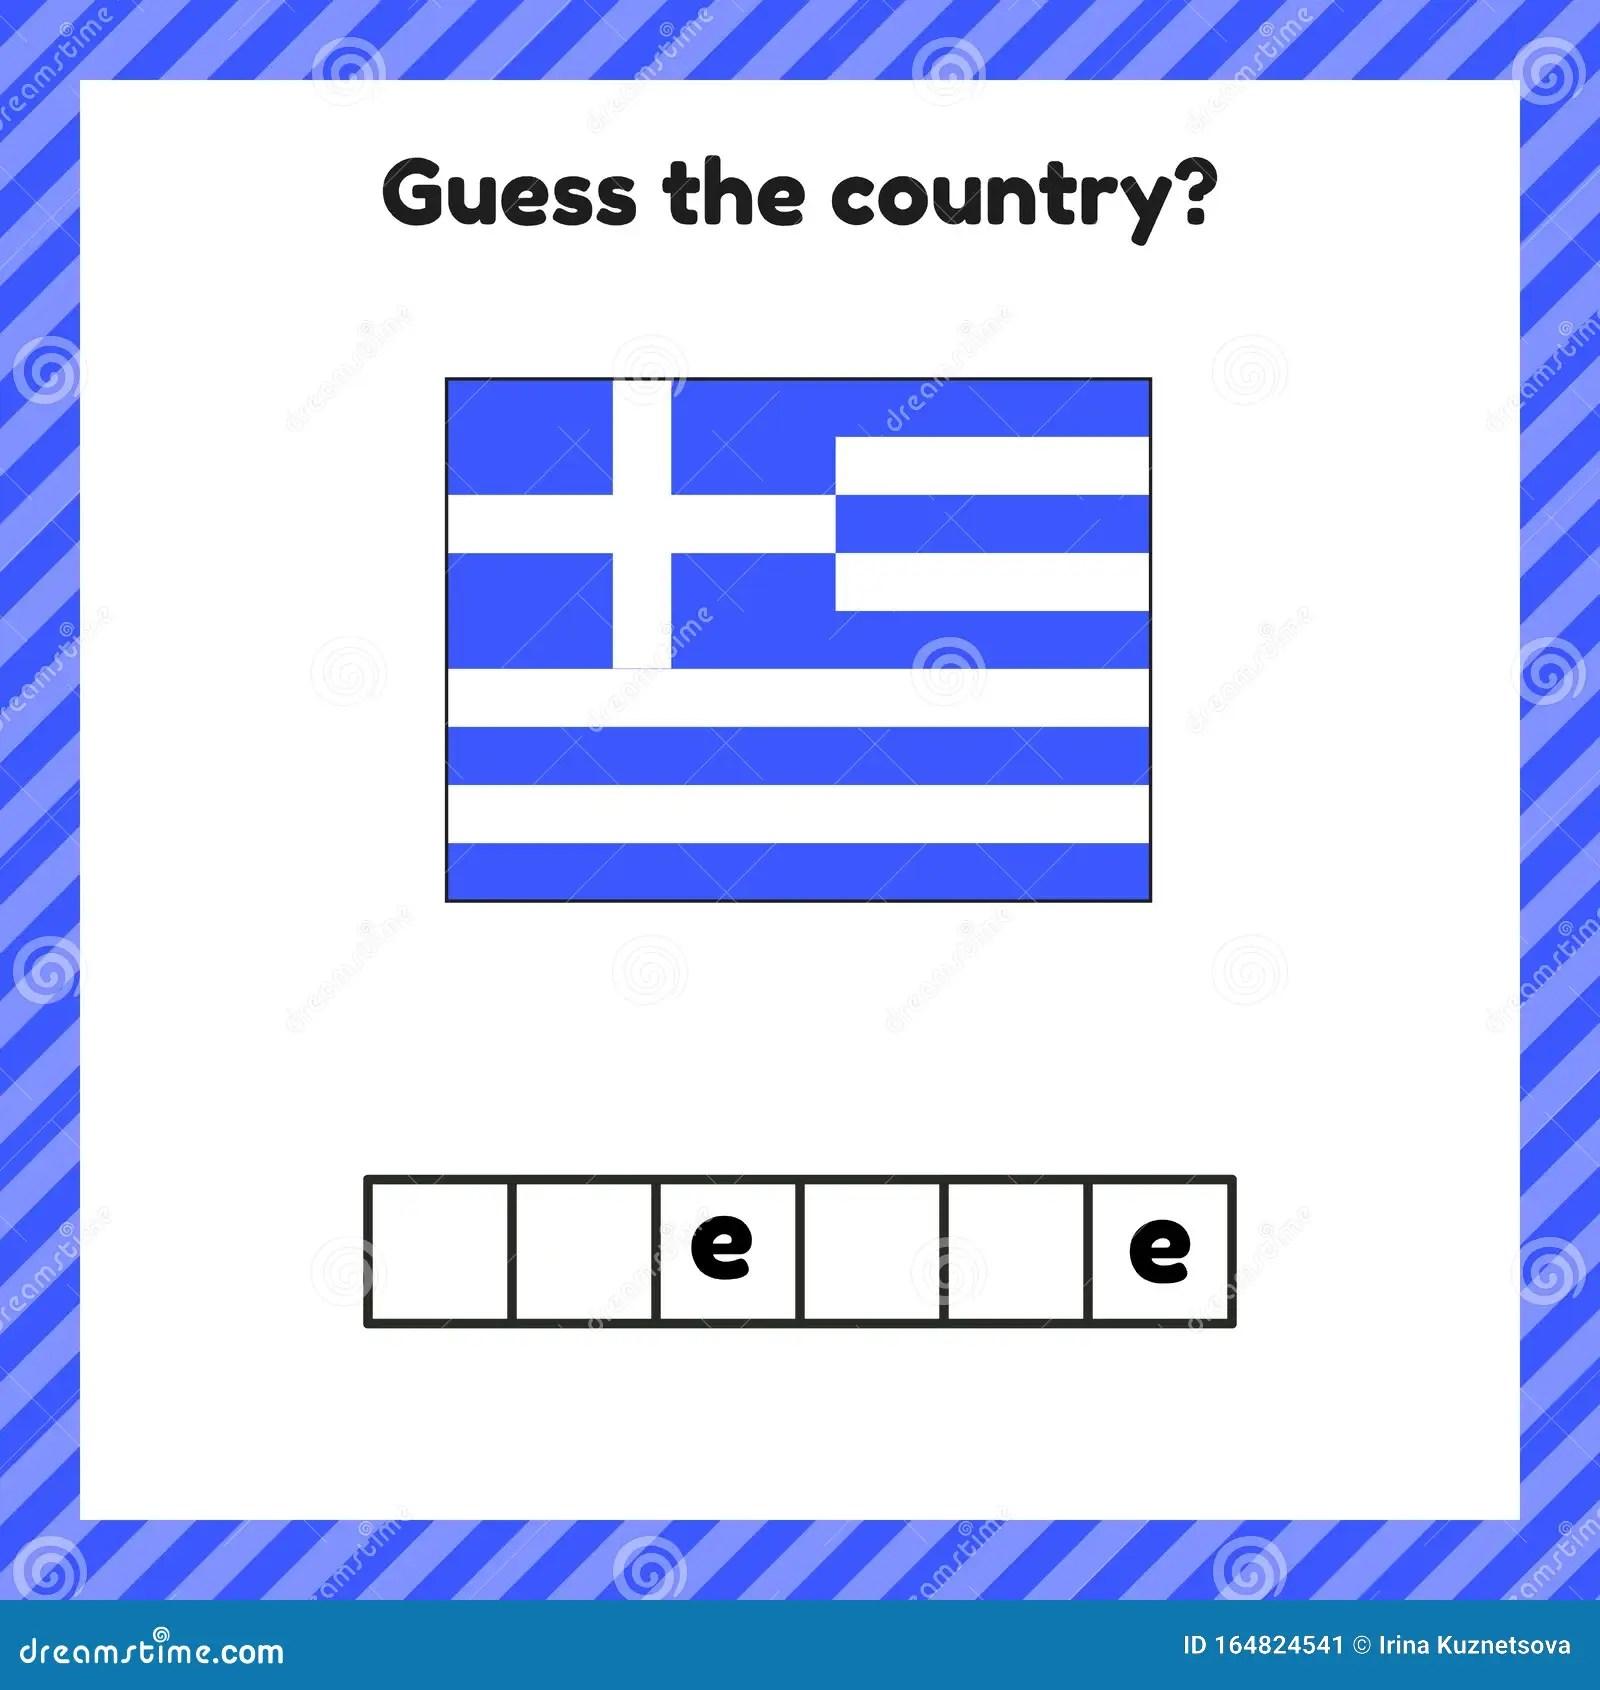 Worksheet On Geography For Preschool And School Kids